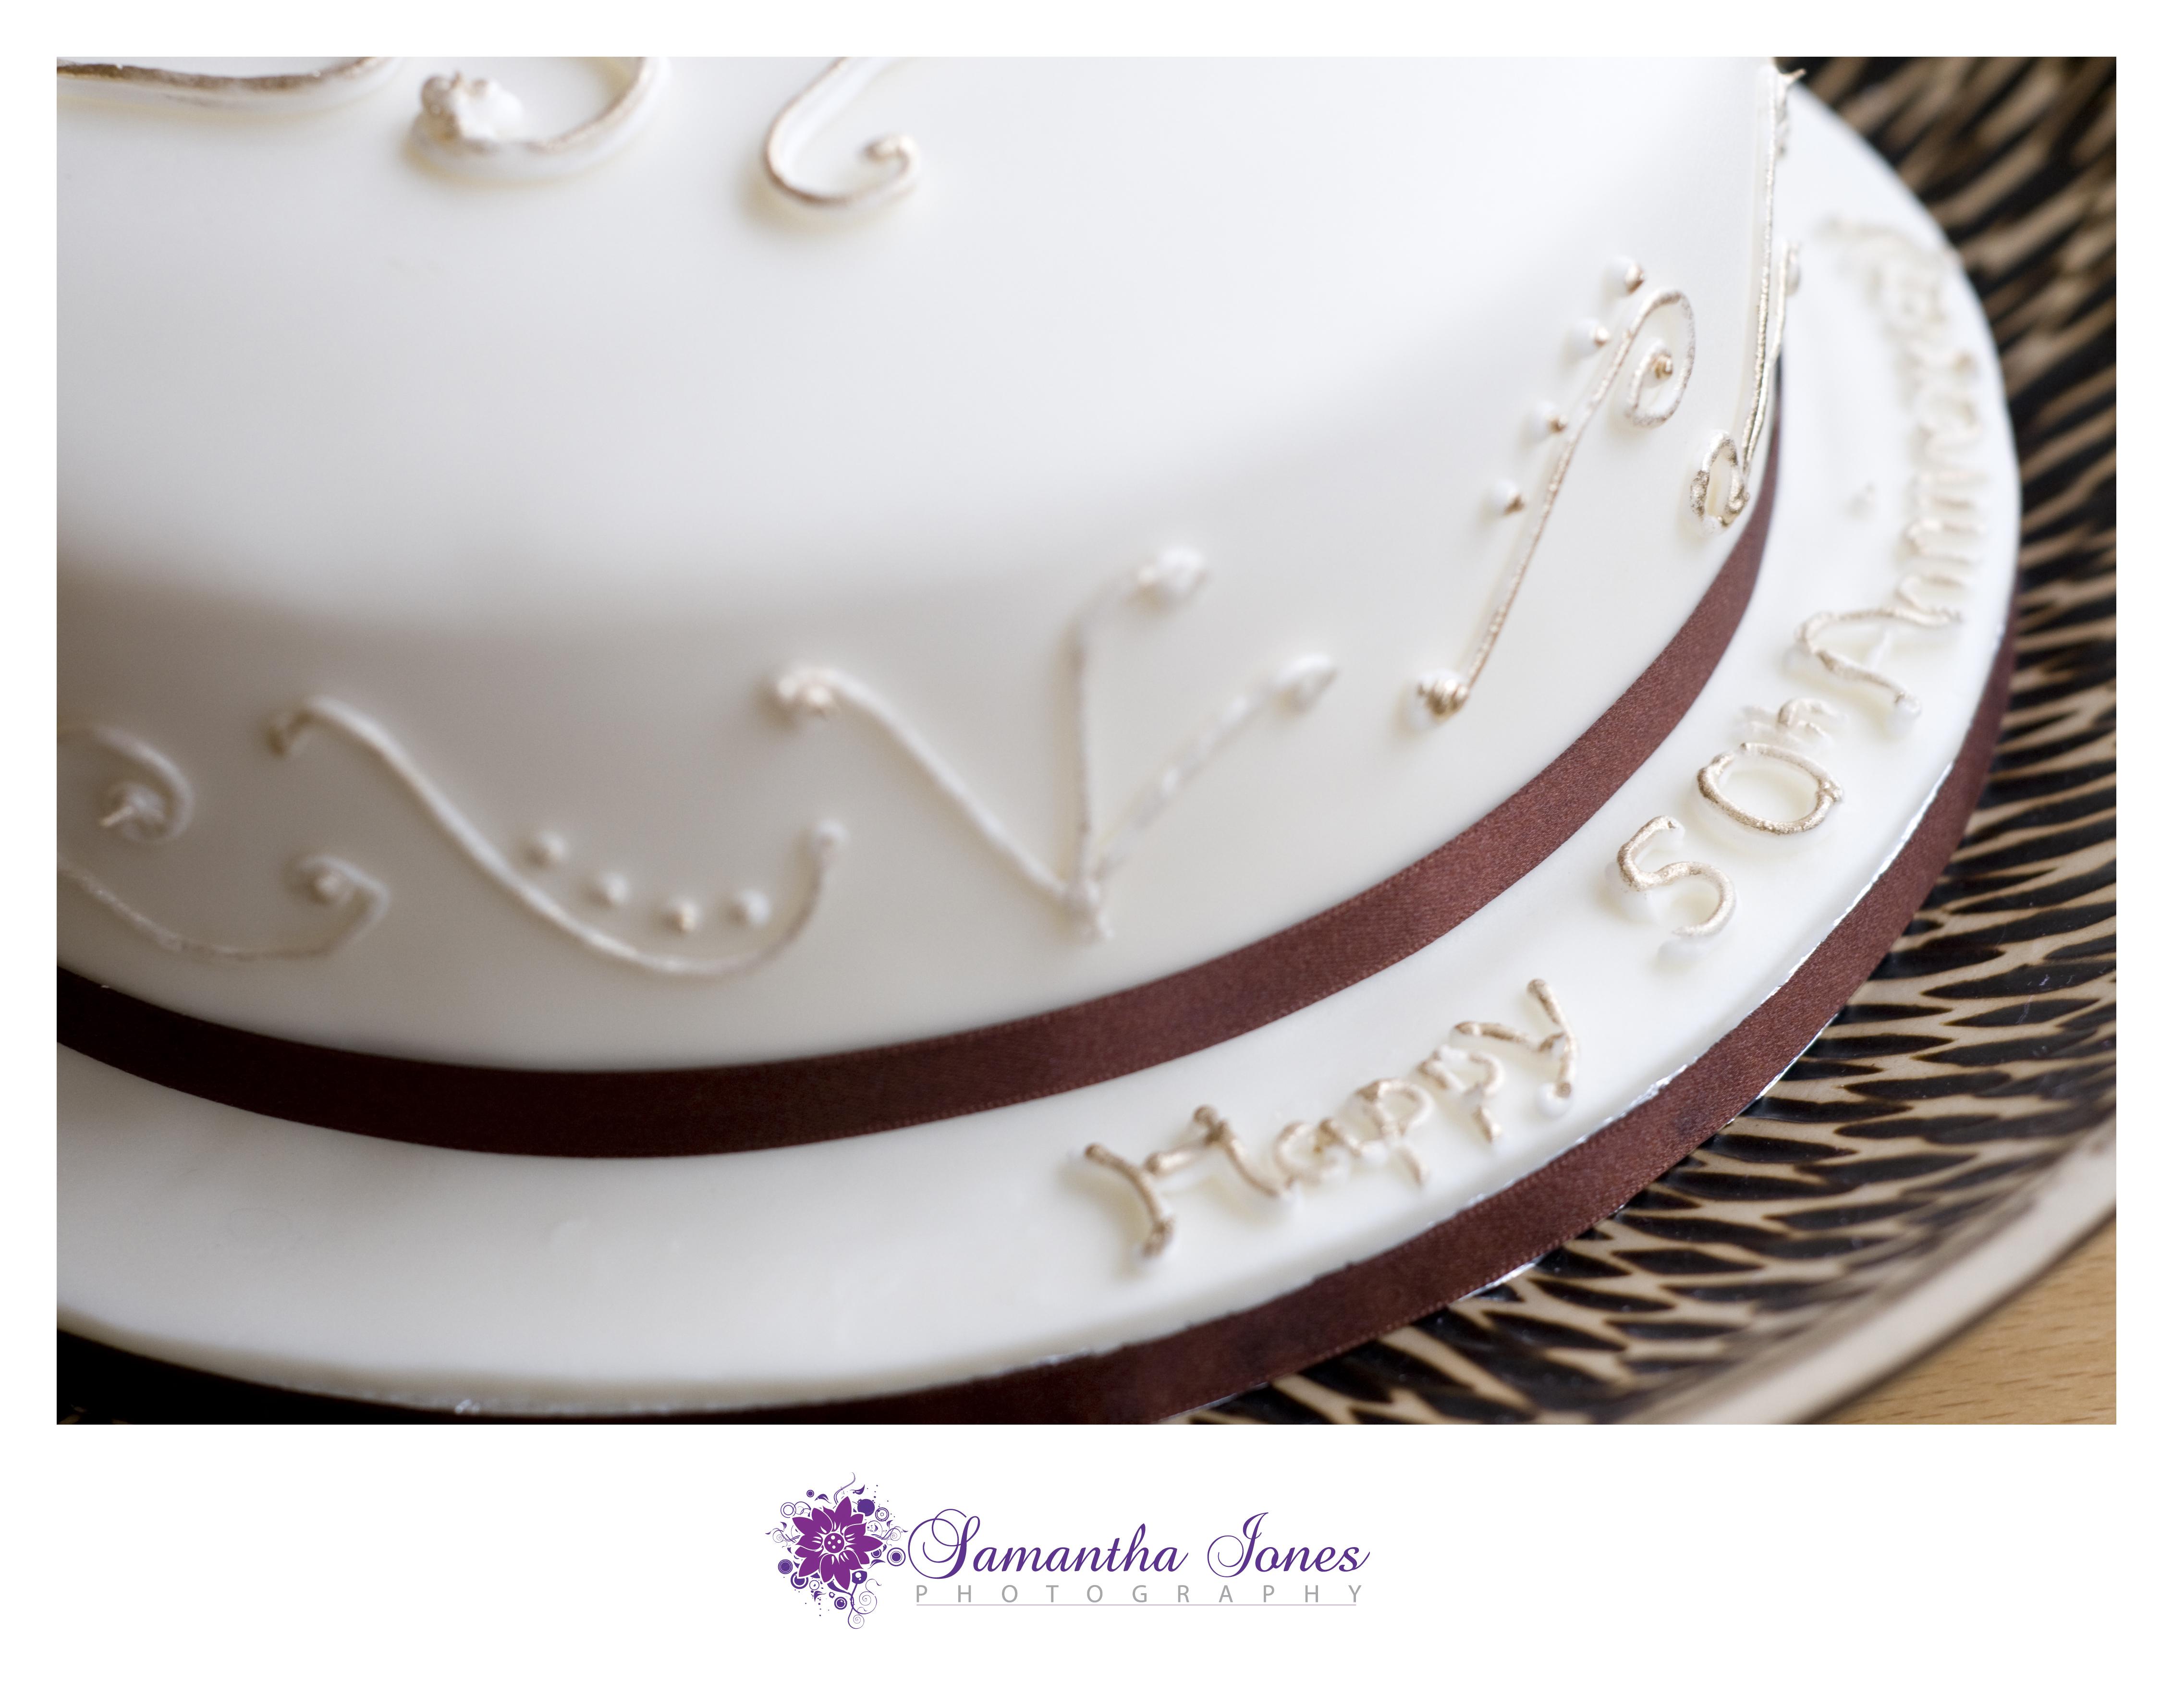 Golden Wedding Anniversary} celebration | Samantha Jones Photography